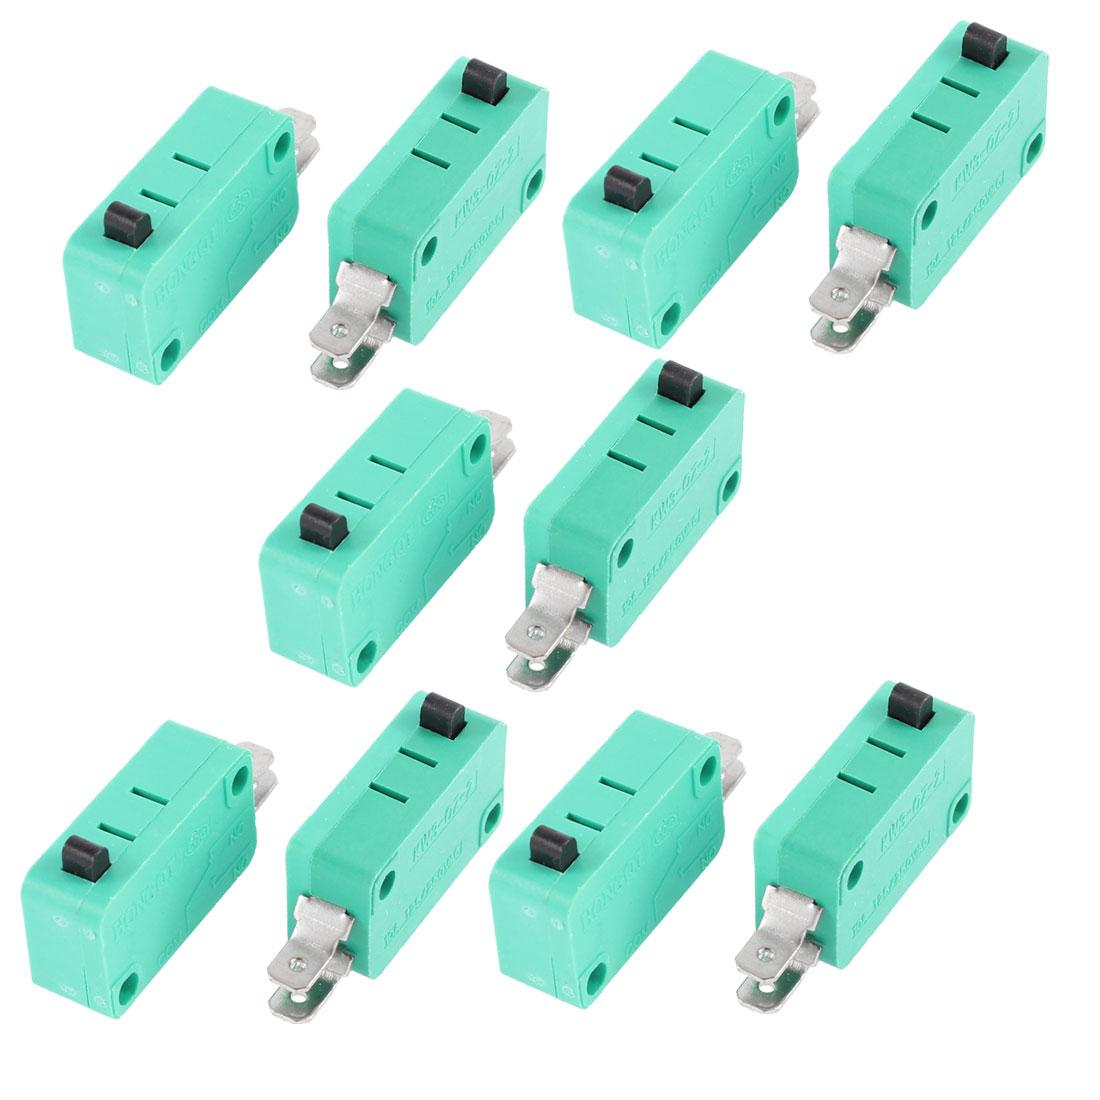 AC 250V/125V 10A 1 NO 1 NC Momentary Action 2 Terminals Micro Switch 10 Pcs